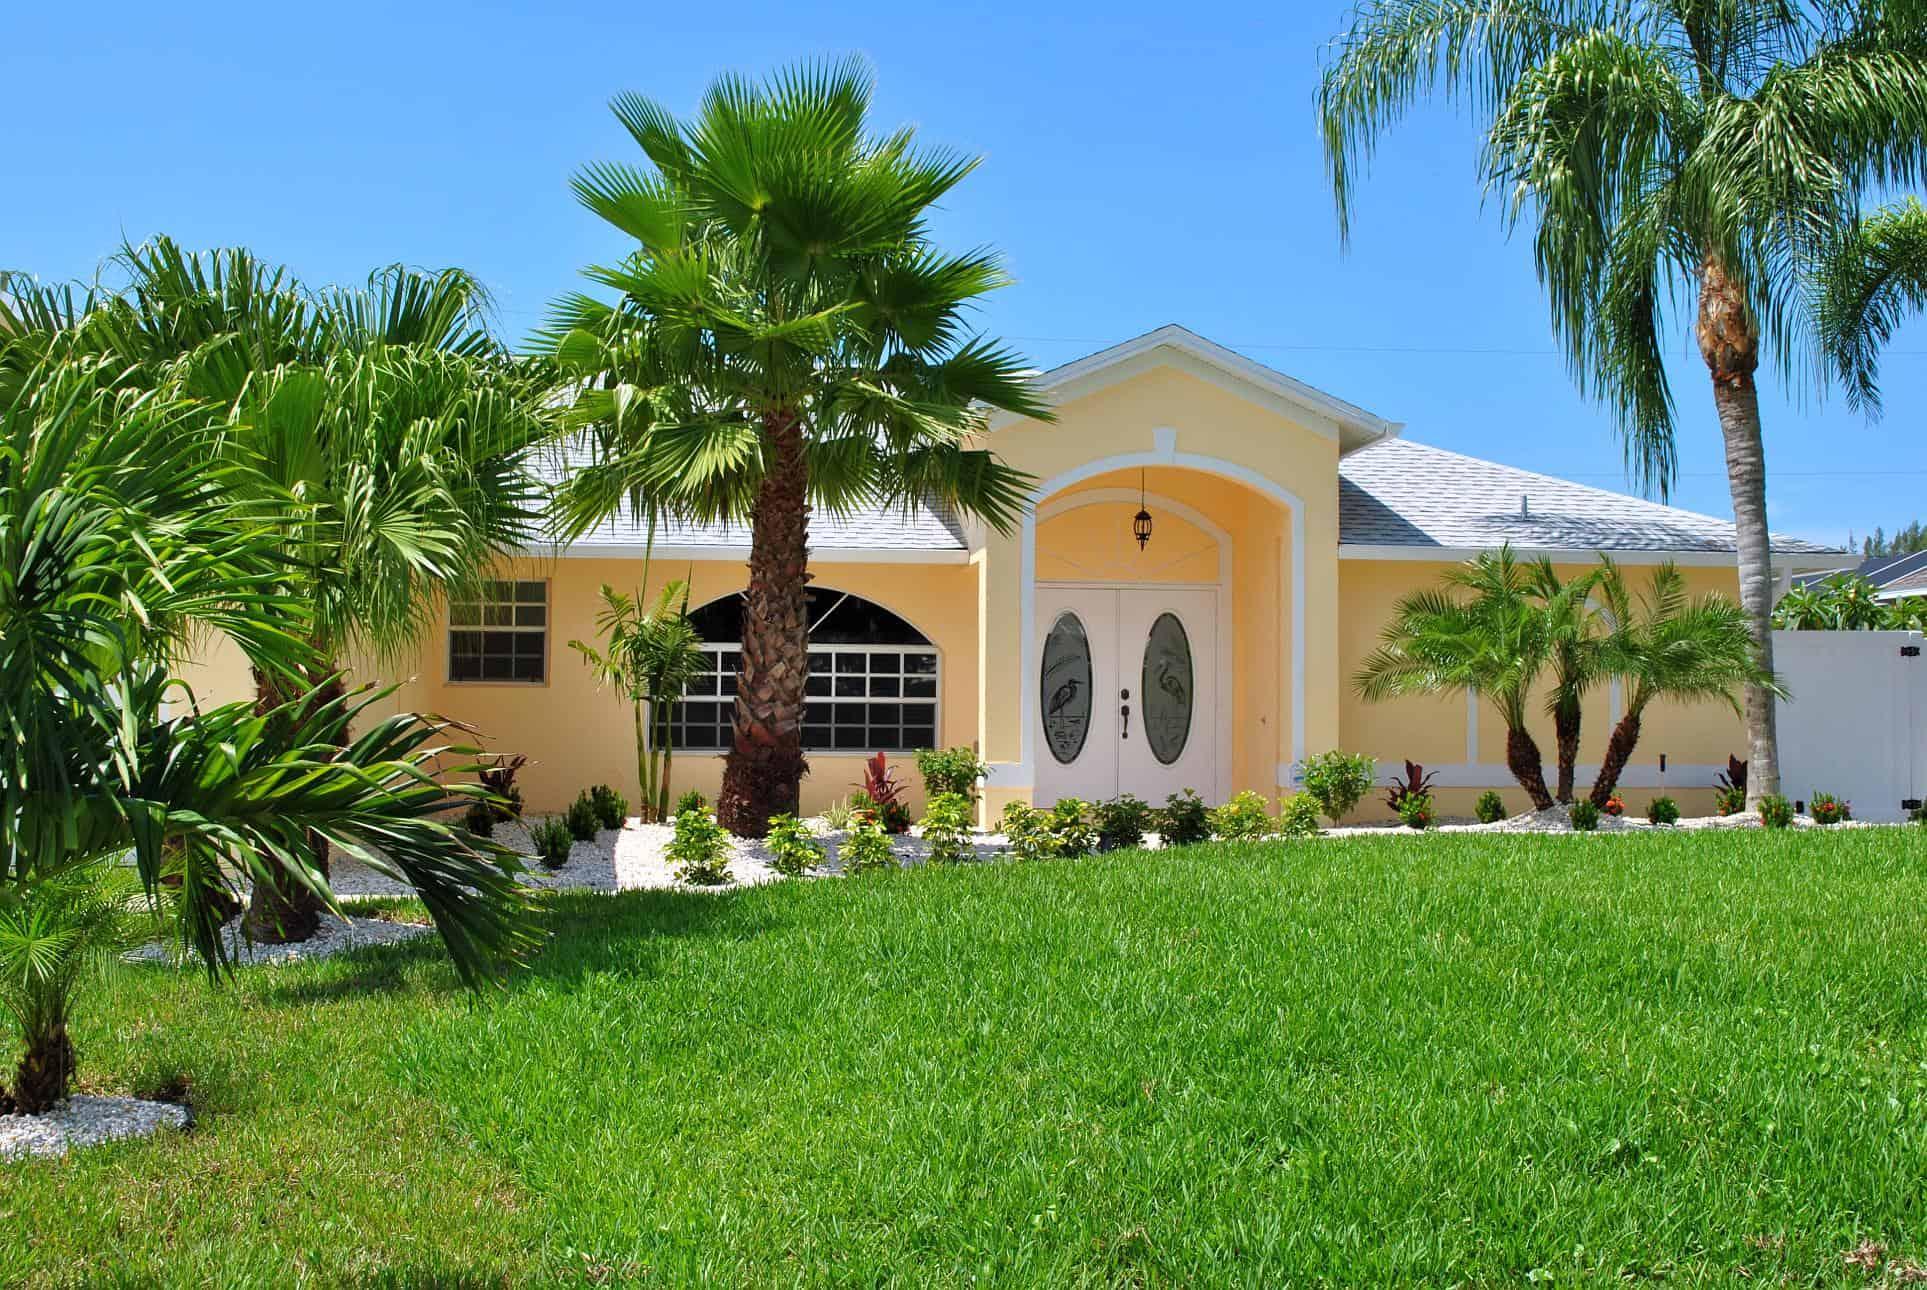 Ferienhaus Villa Endless Paradise | SunshineState Network